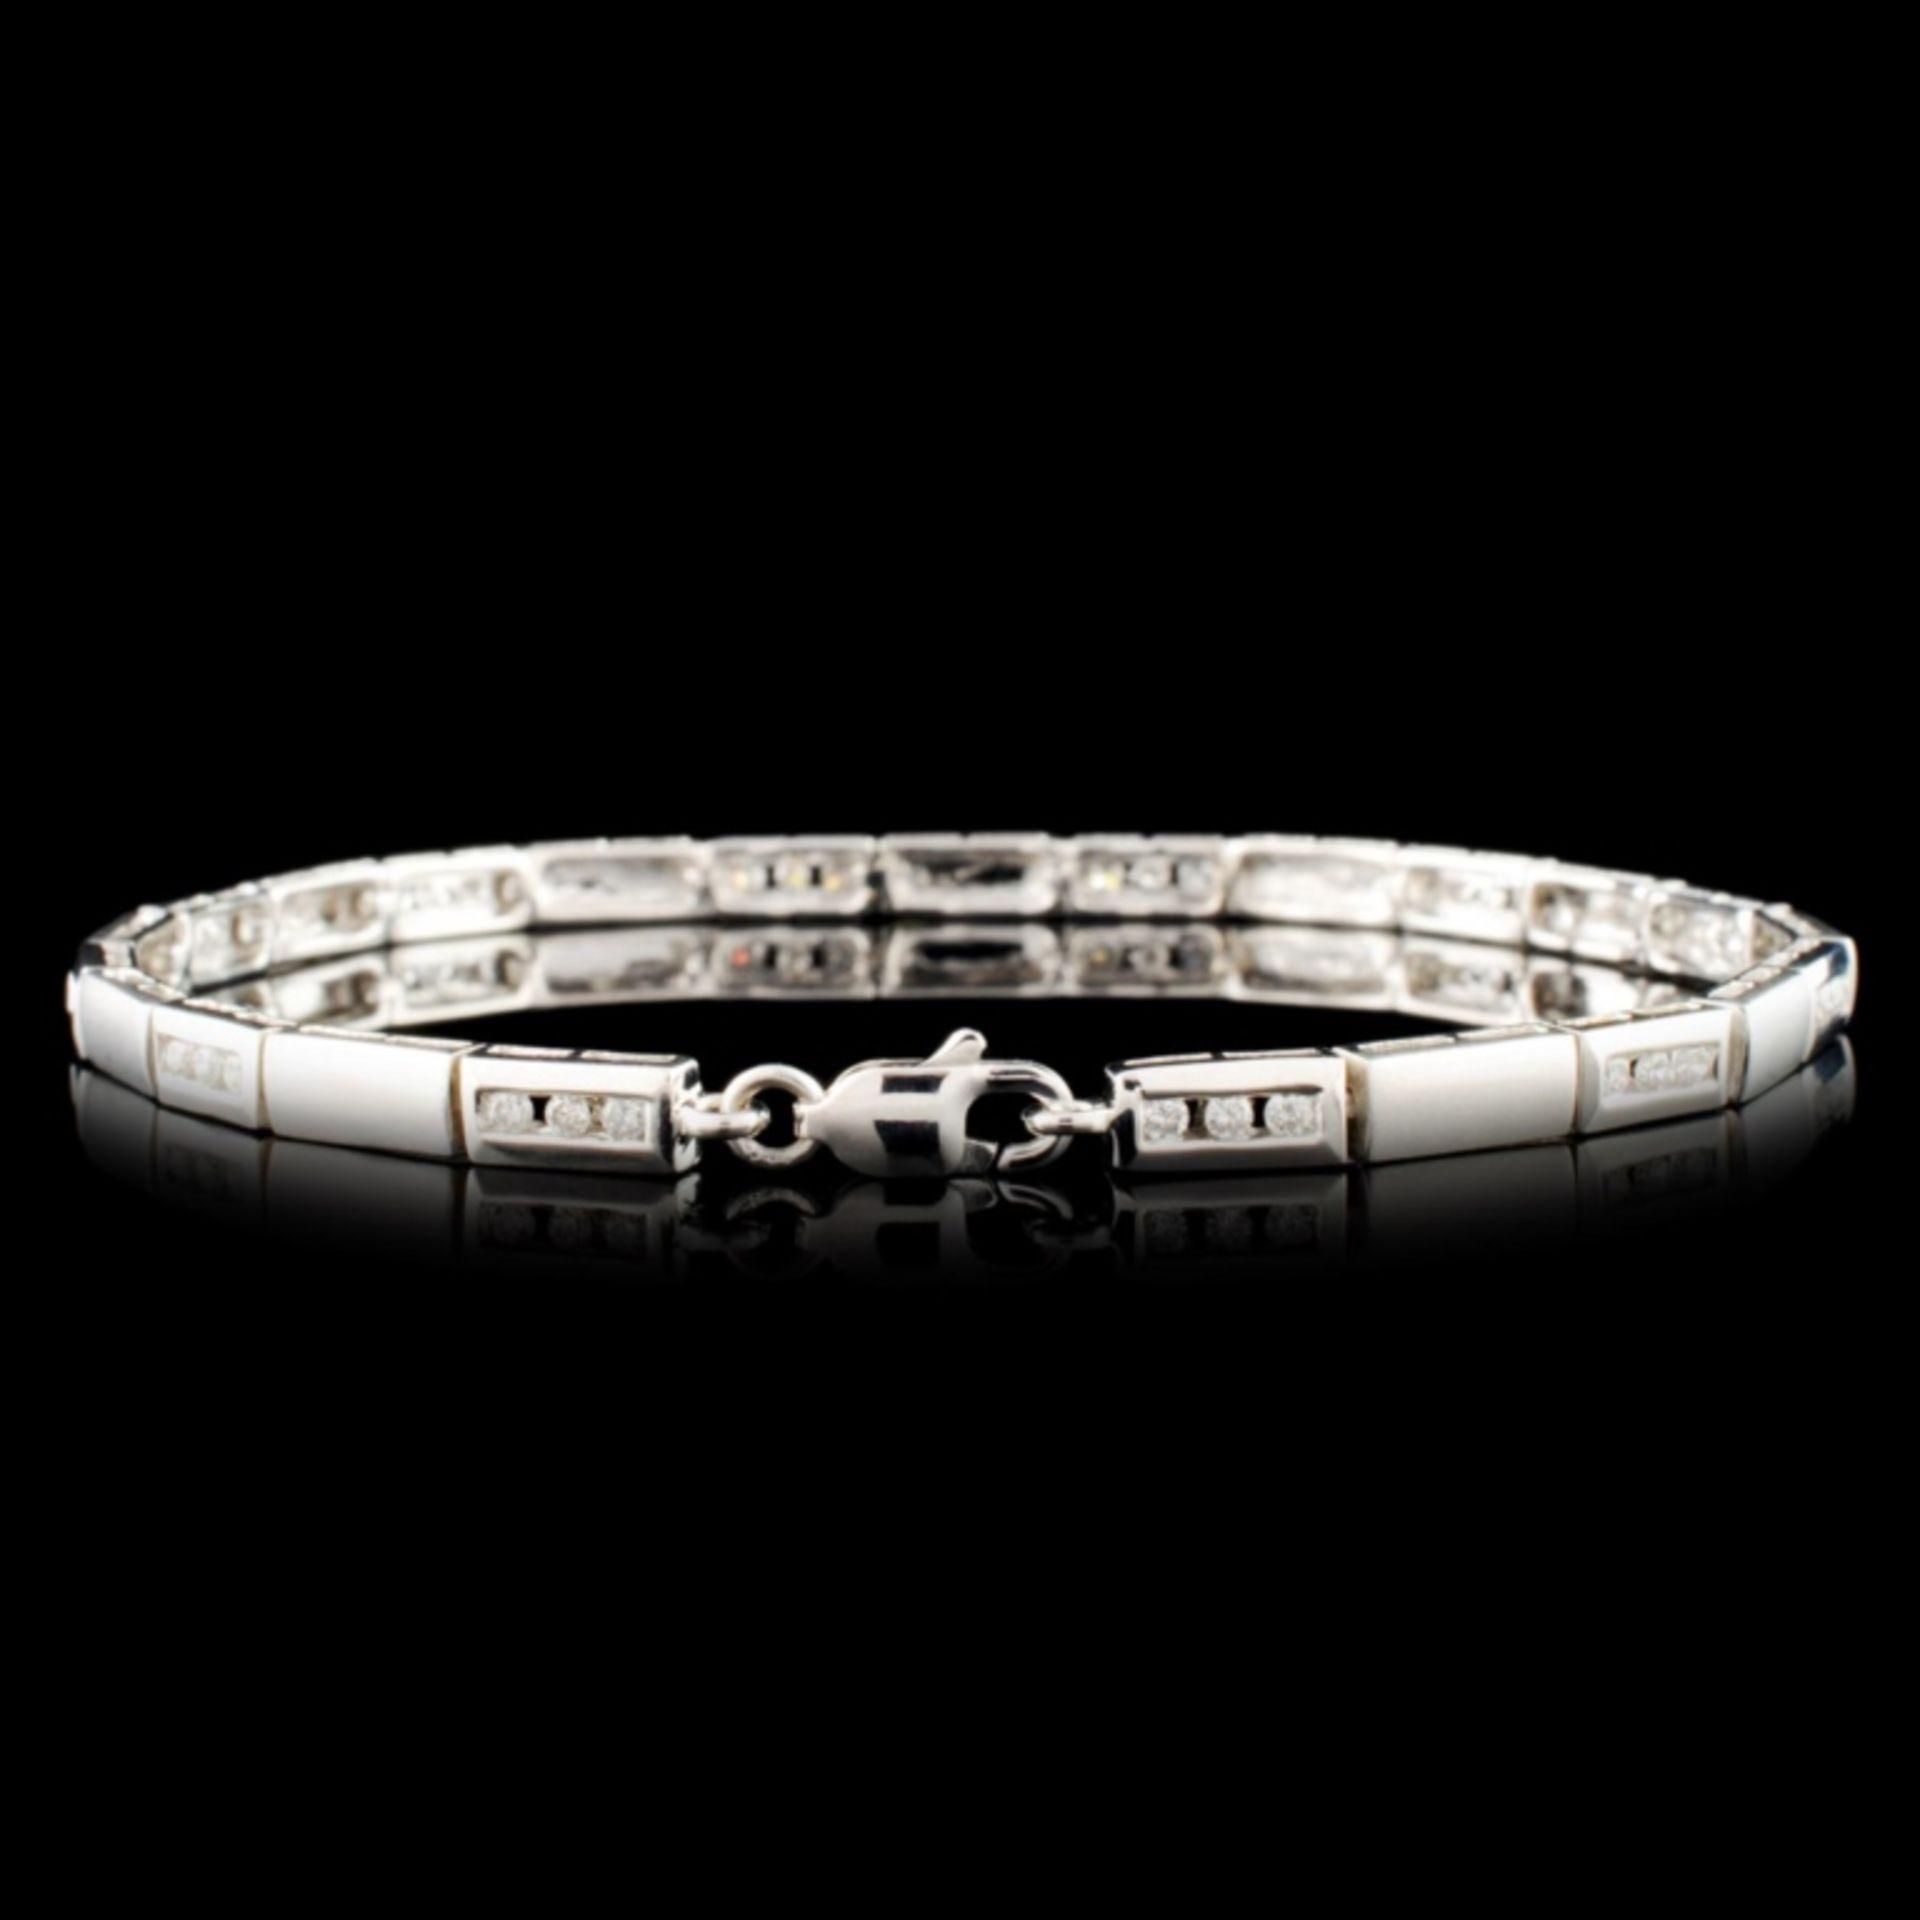 14K Gold 0.38ctw Diamond Bracelet - Image 2 of 4